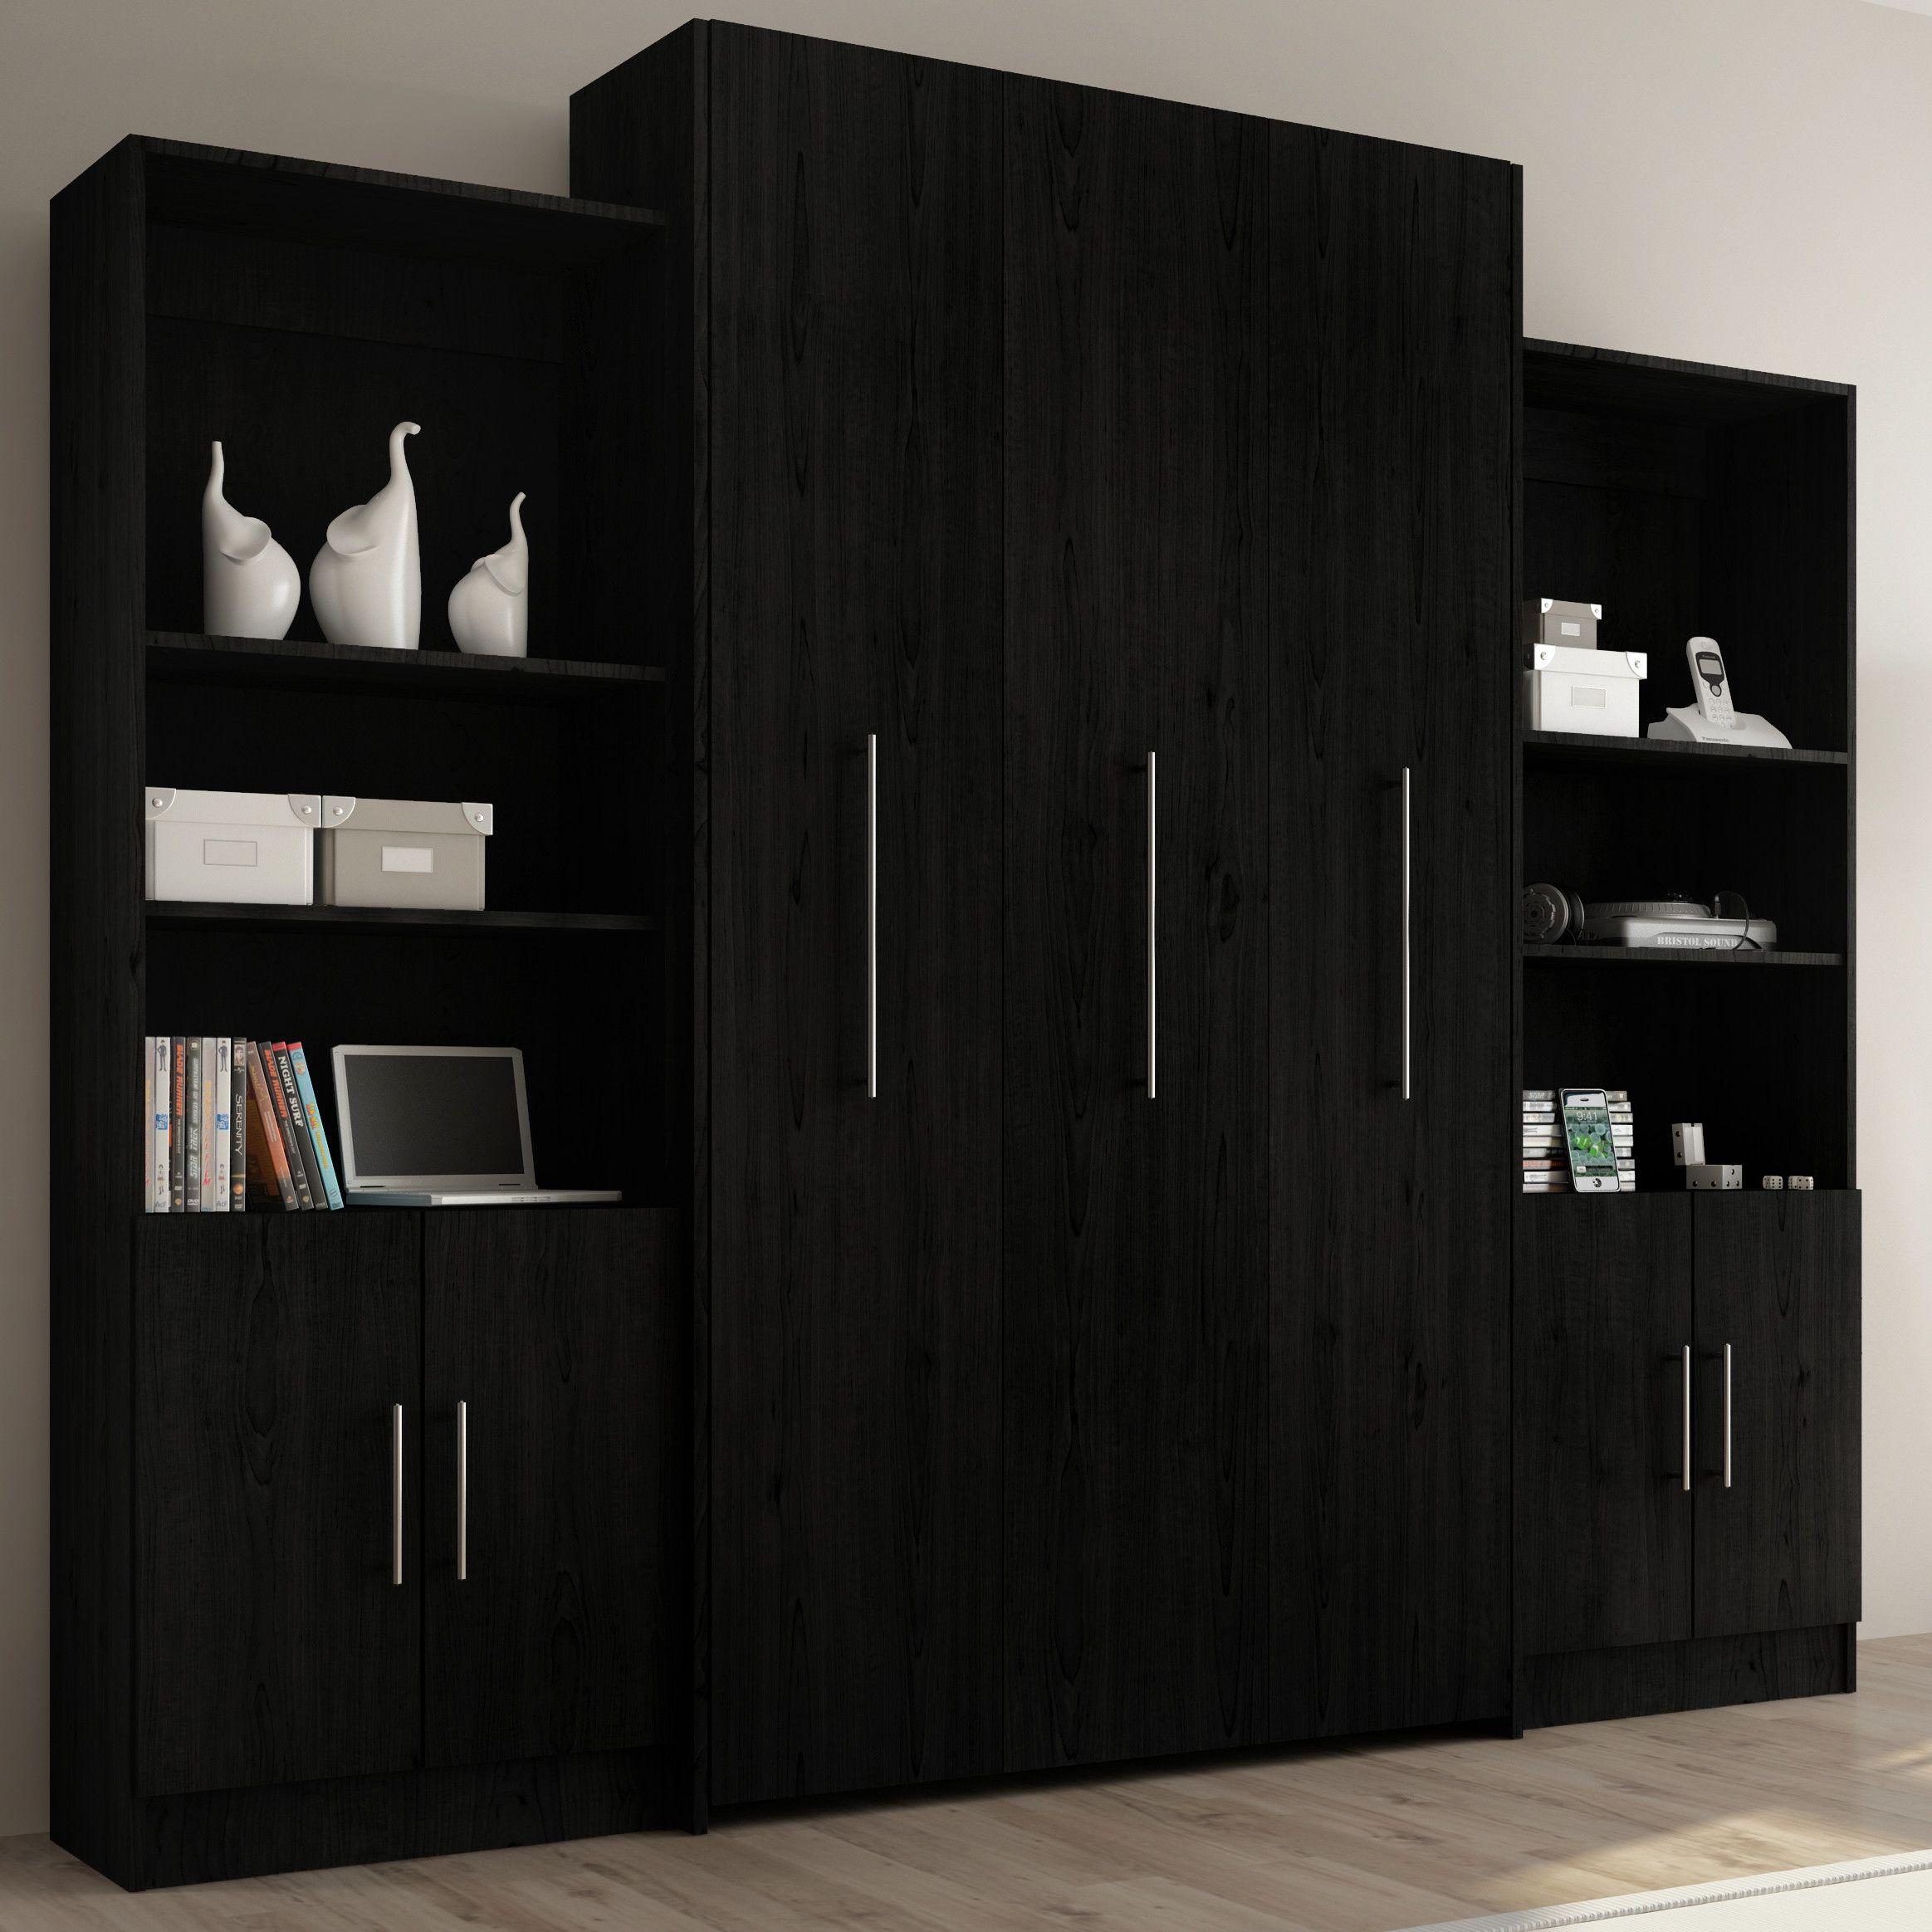 Customer Image Zoomed Storage, Renovation hardware, Tall